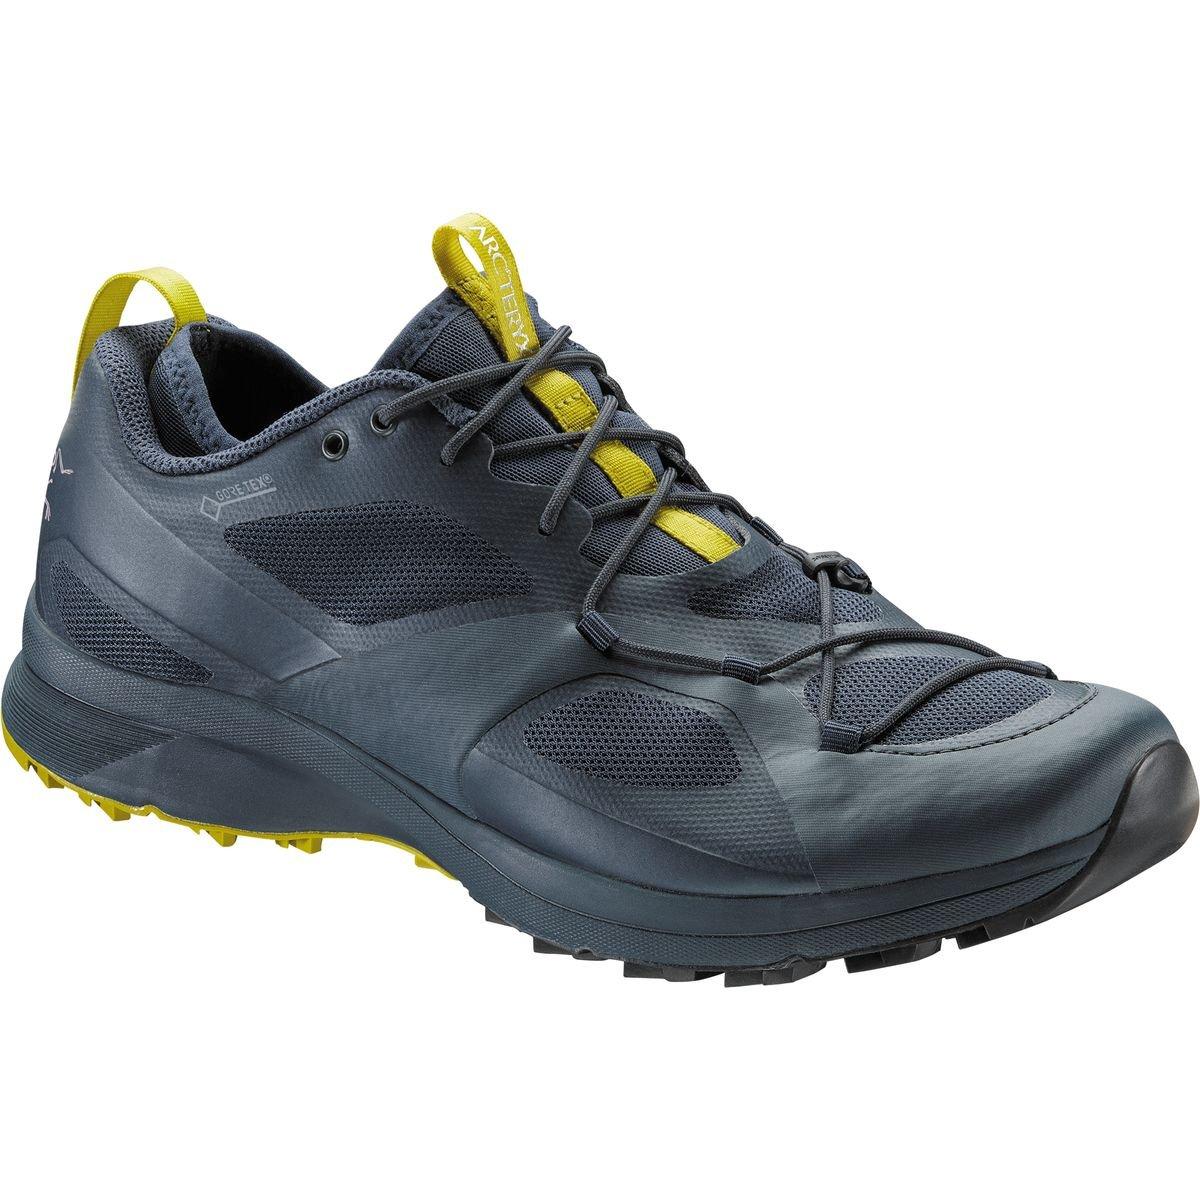 Mens Arc/'teryx 20414-367065-27716-US 10.0//UK 9.5 Arcteryx Norvan VT GTX Trail Running Shoe